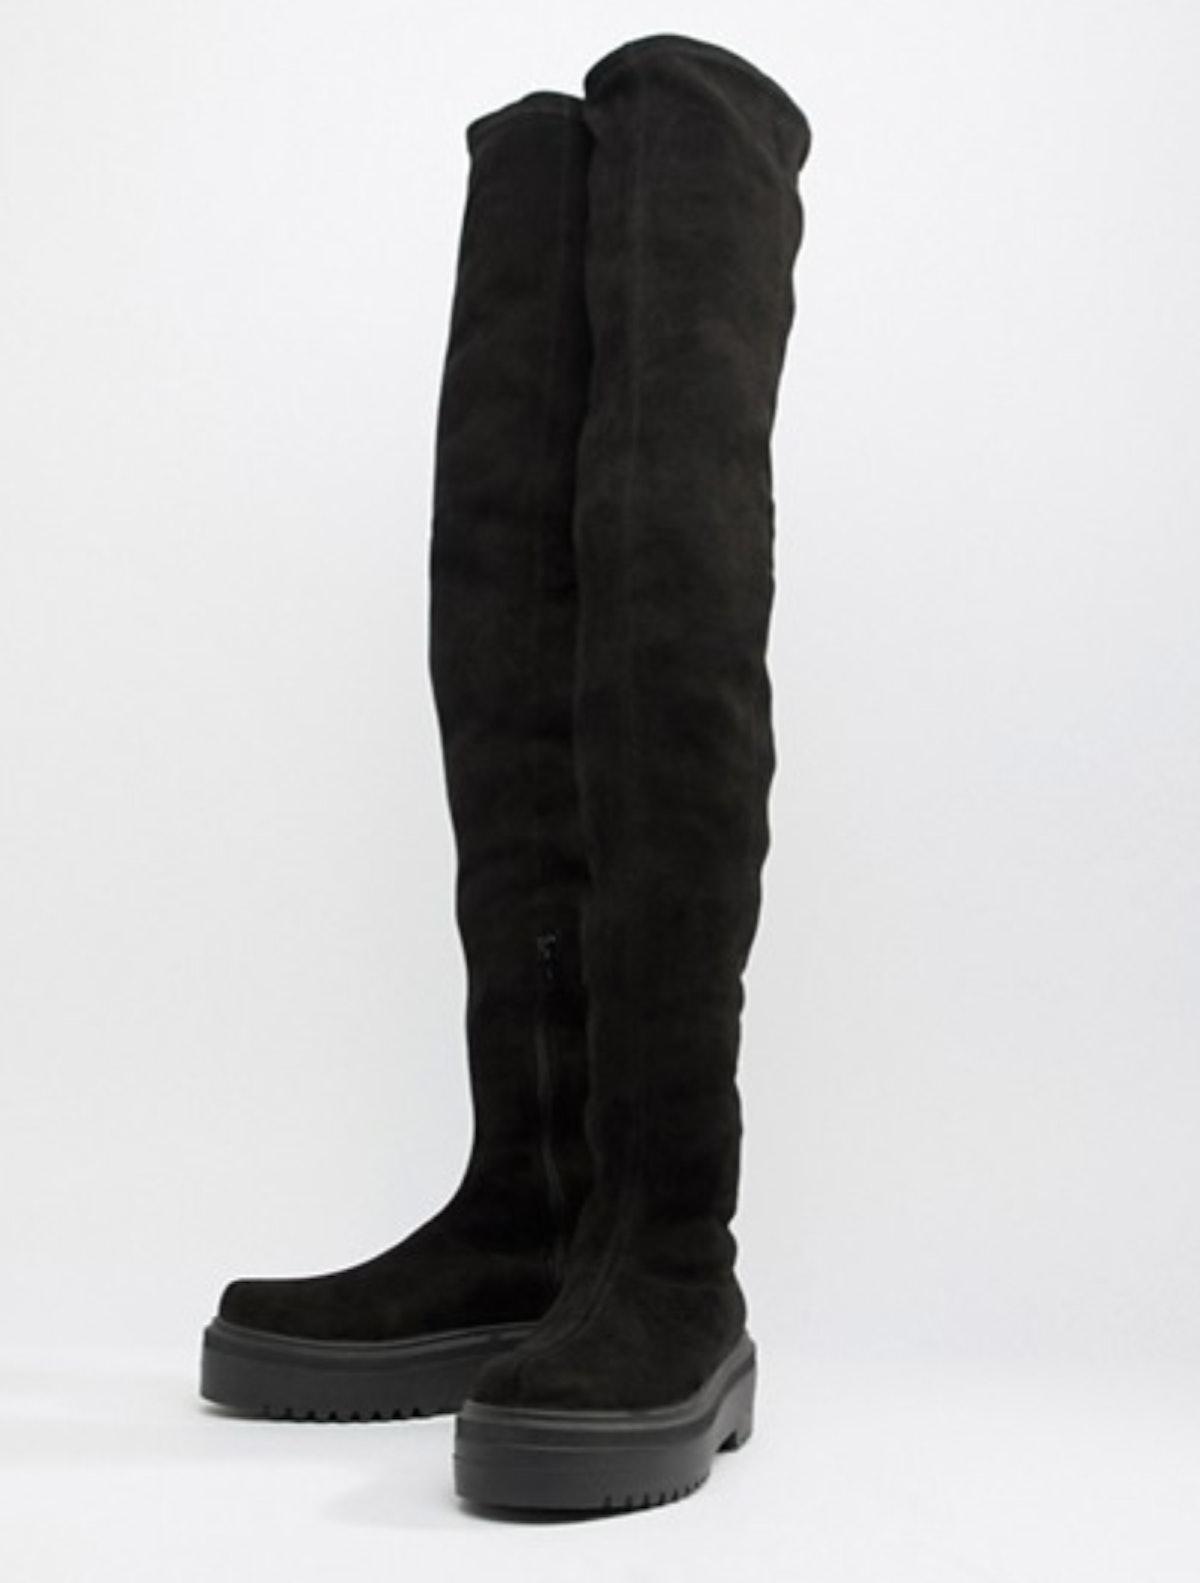 ASOS DESIGN Kami Flat Chunky Over The Knee Boots